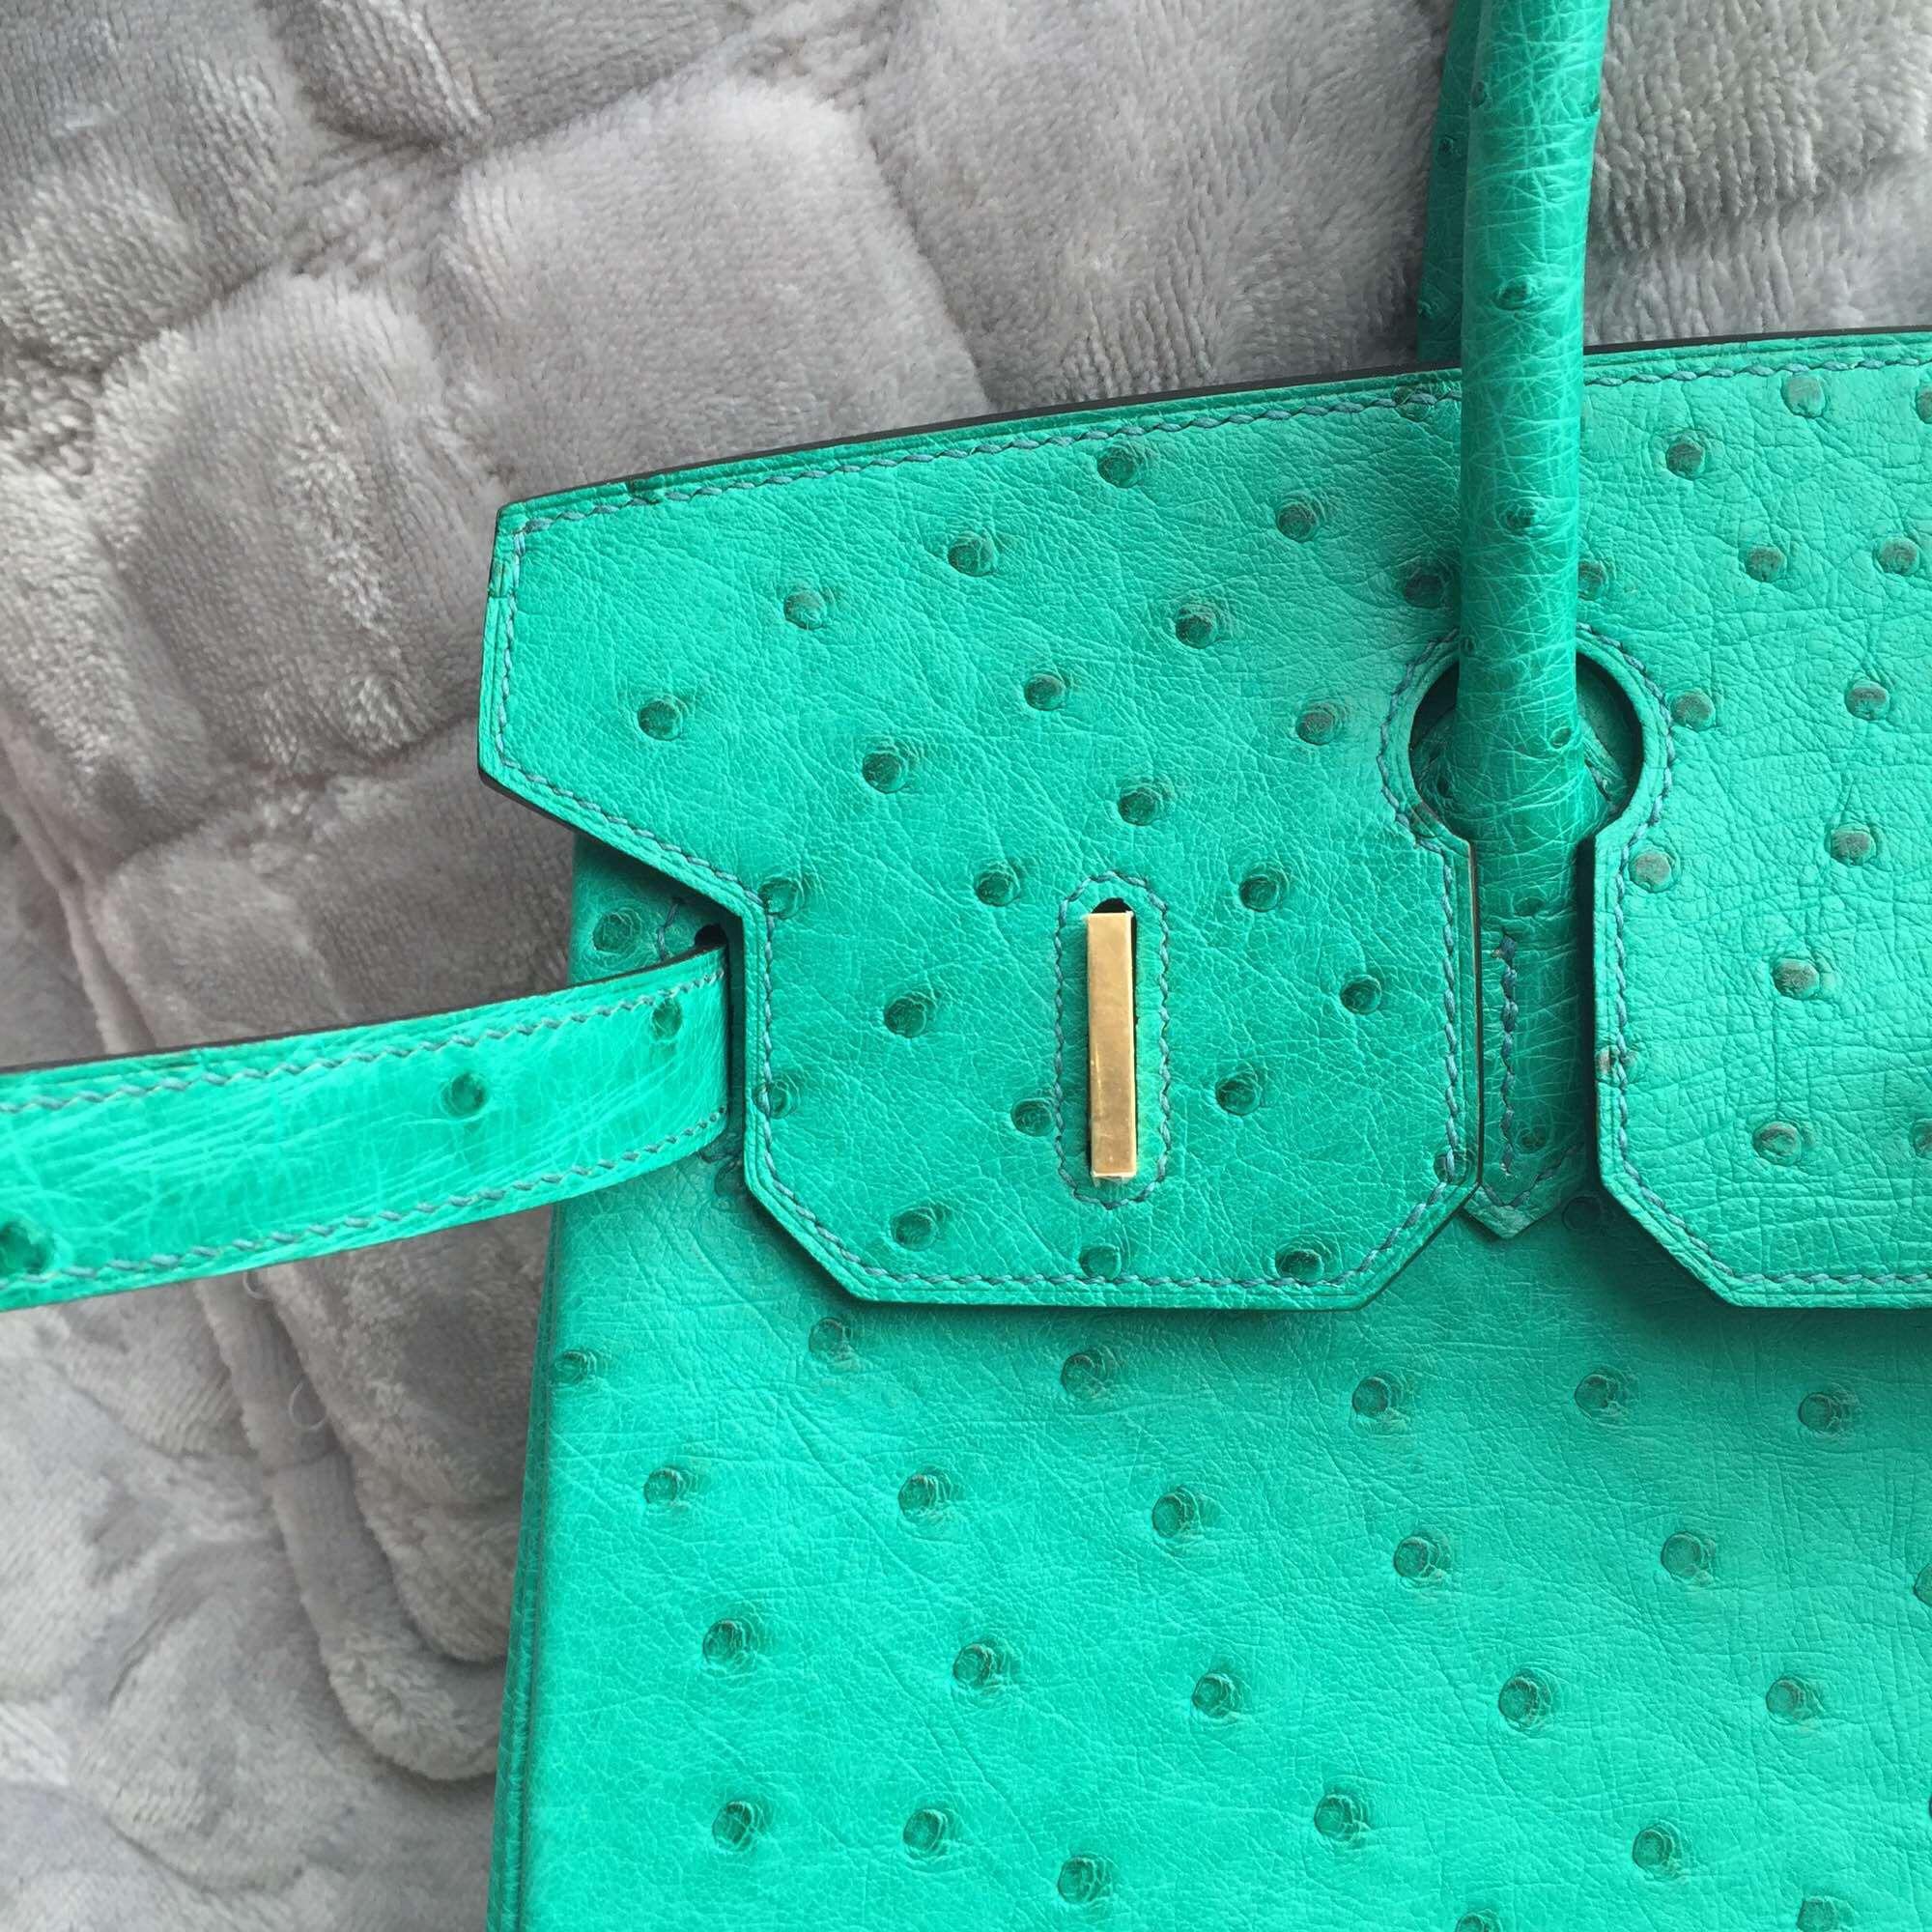 6Q Emerald Green Ostrich Leather Hermes Birkin Bag 30CM Gold Hardware